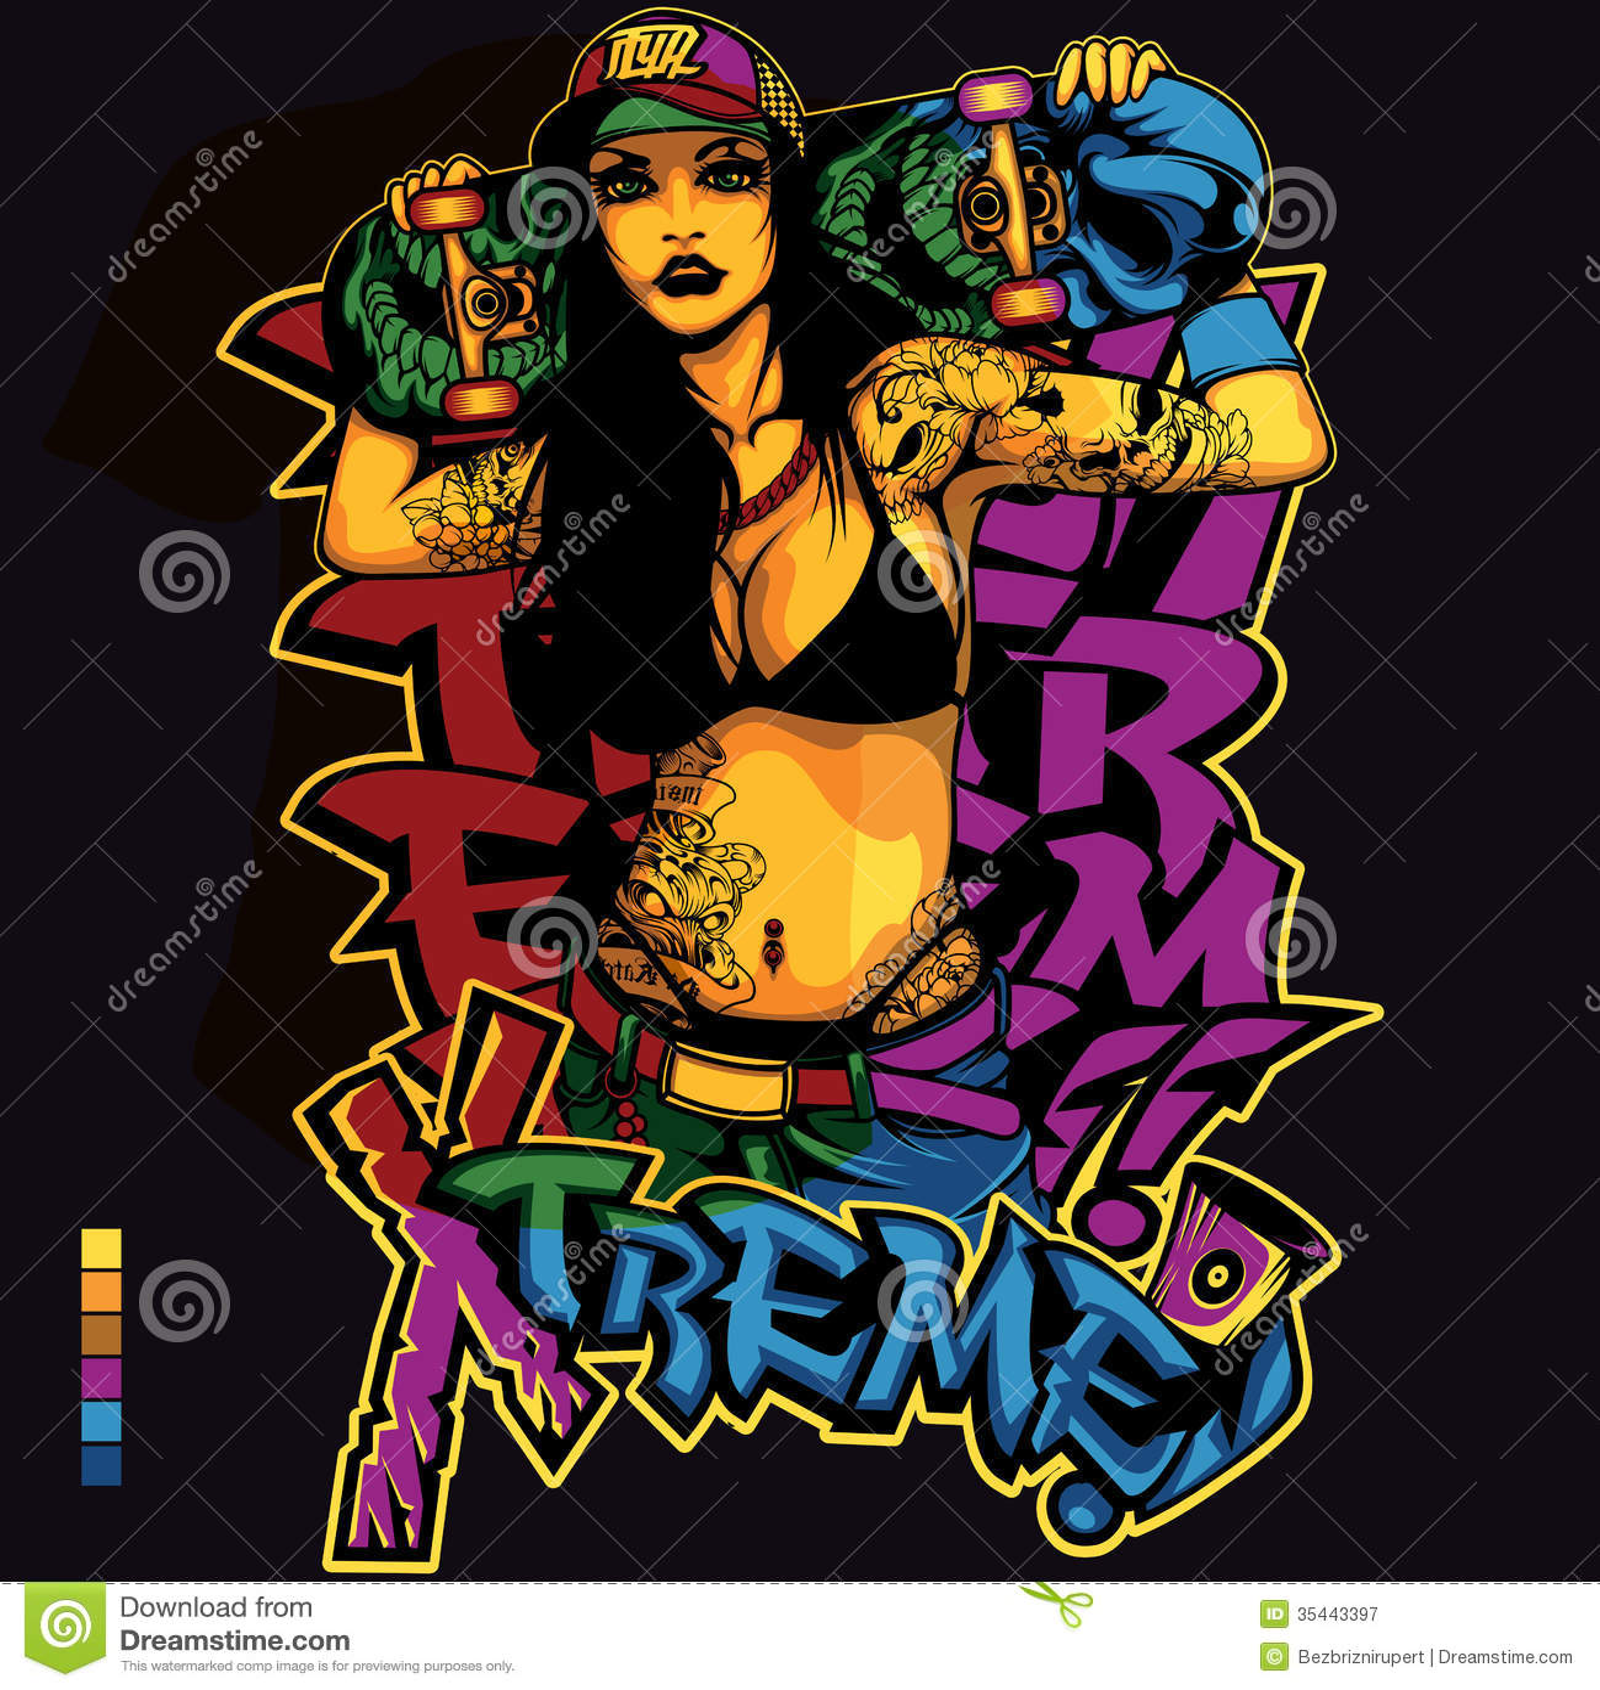 Biker Girl Wallpaper Free Download Hip Hop Girl Shirt Design Stock Illustration Illustration